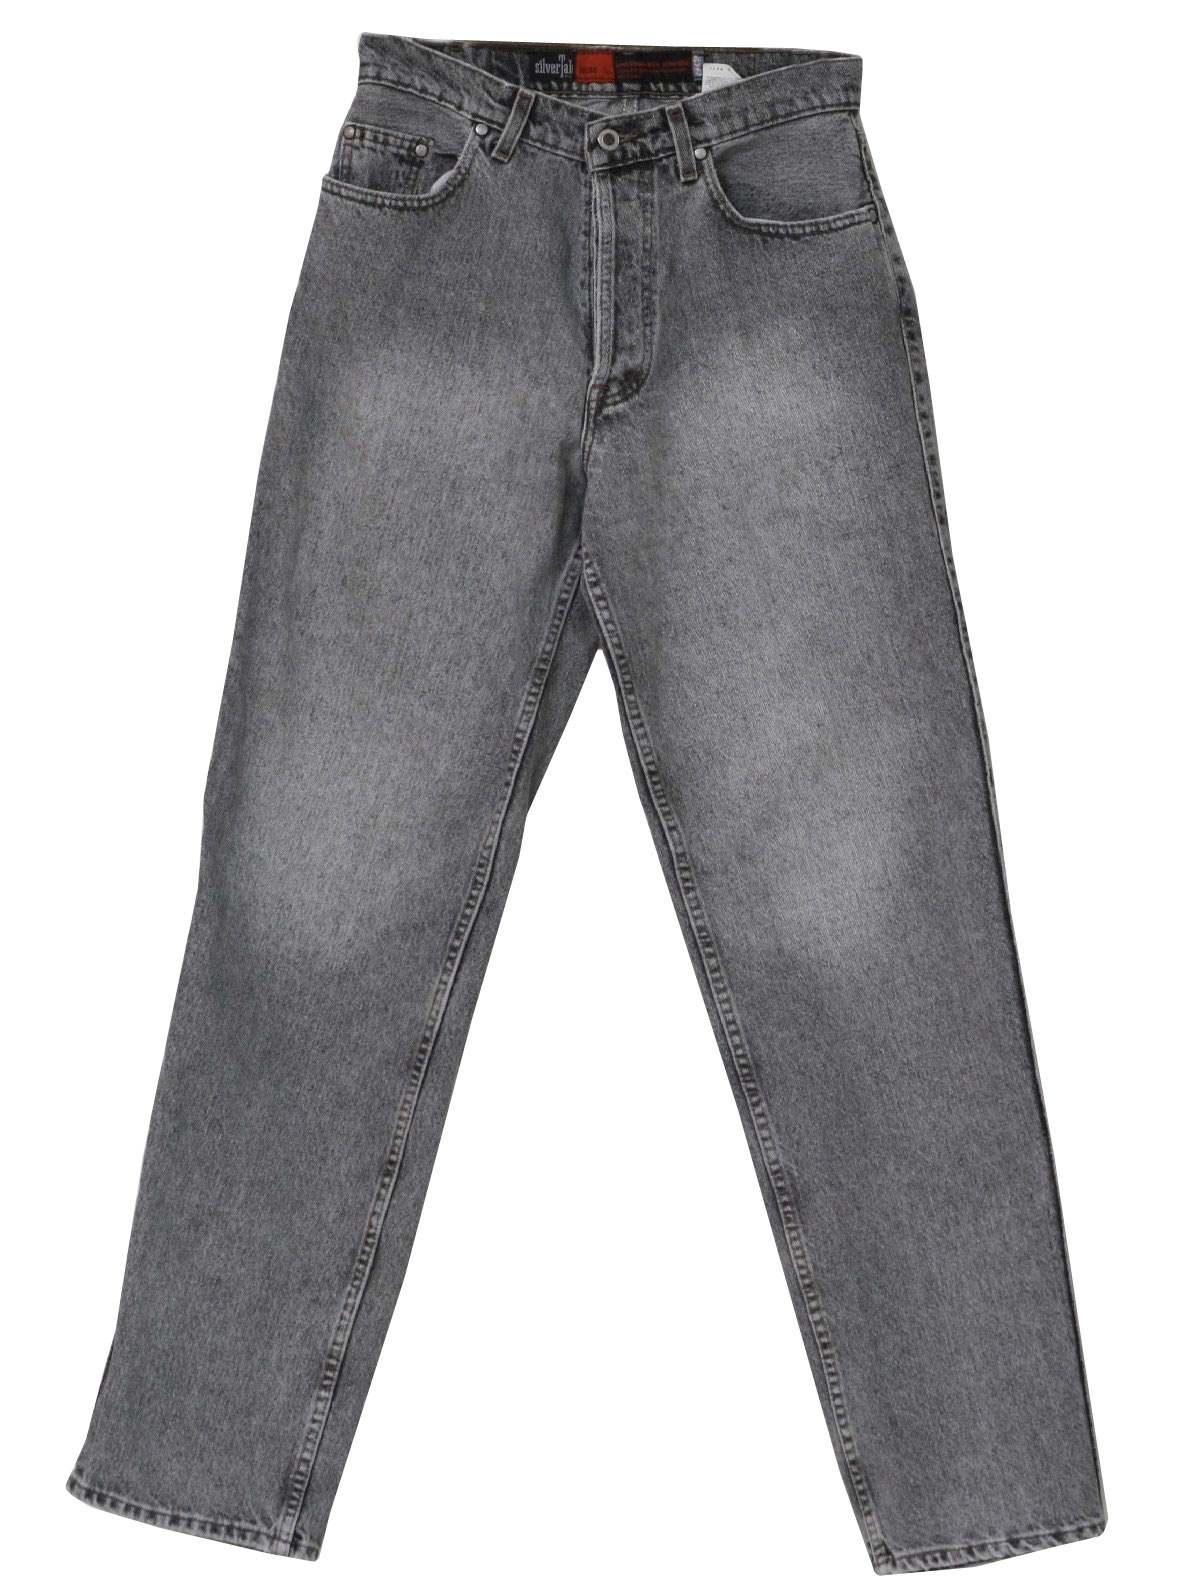 Retro 80s Pants (Levis Silvertab) : 90s -Levis Silvertab- Mens